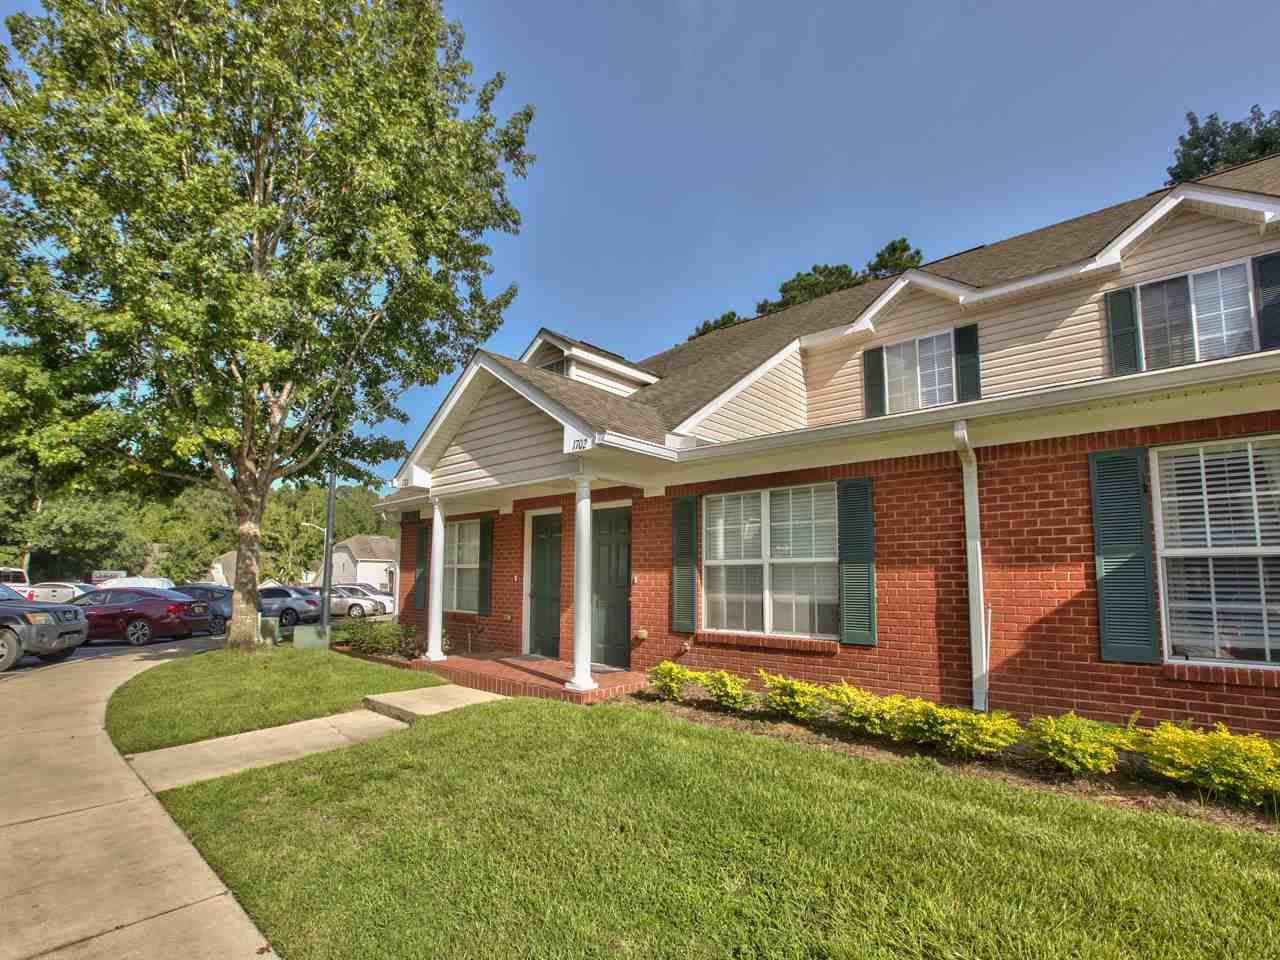 Photo of 4434 GEARHART Road #1702, TALLAHASSEE, FL 32303 (MLS # 323311)